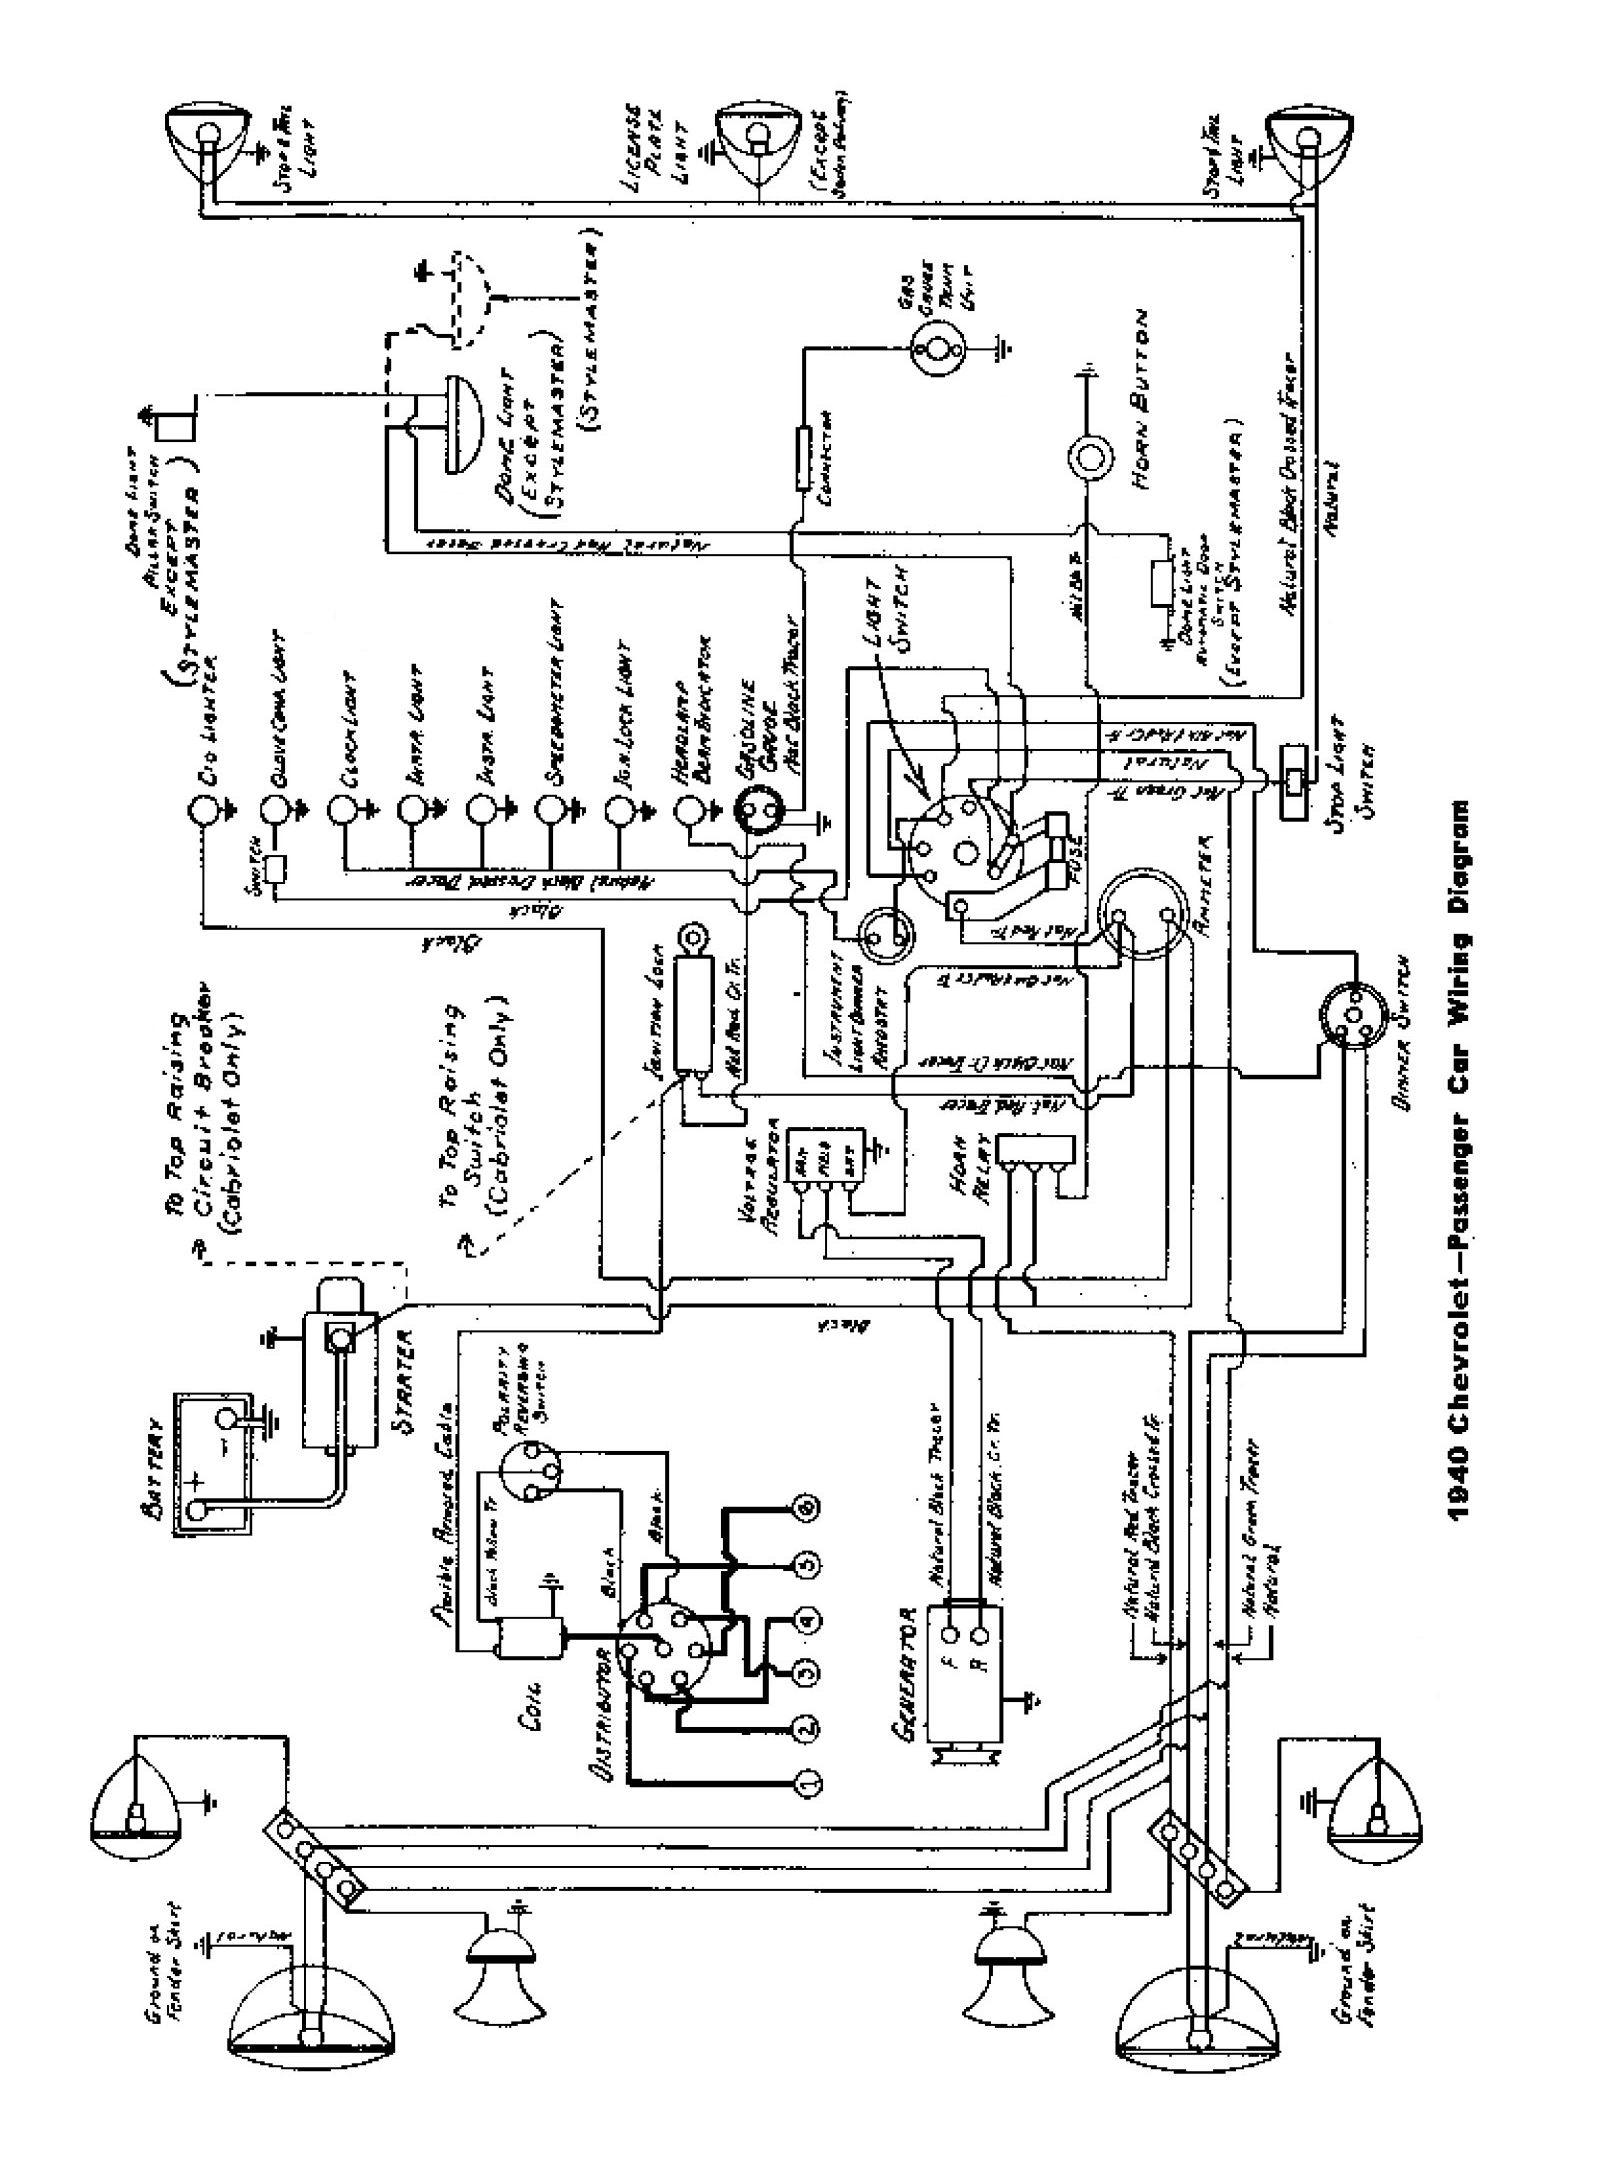 Painless Wiring Harness Diagram Gm | Wiring Diagram - Painless Wiring Harness Diagram